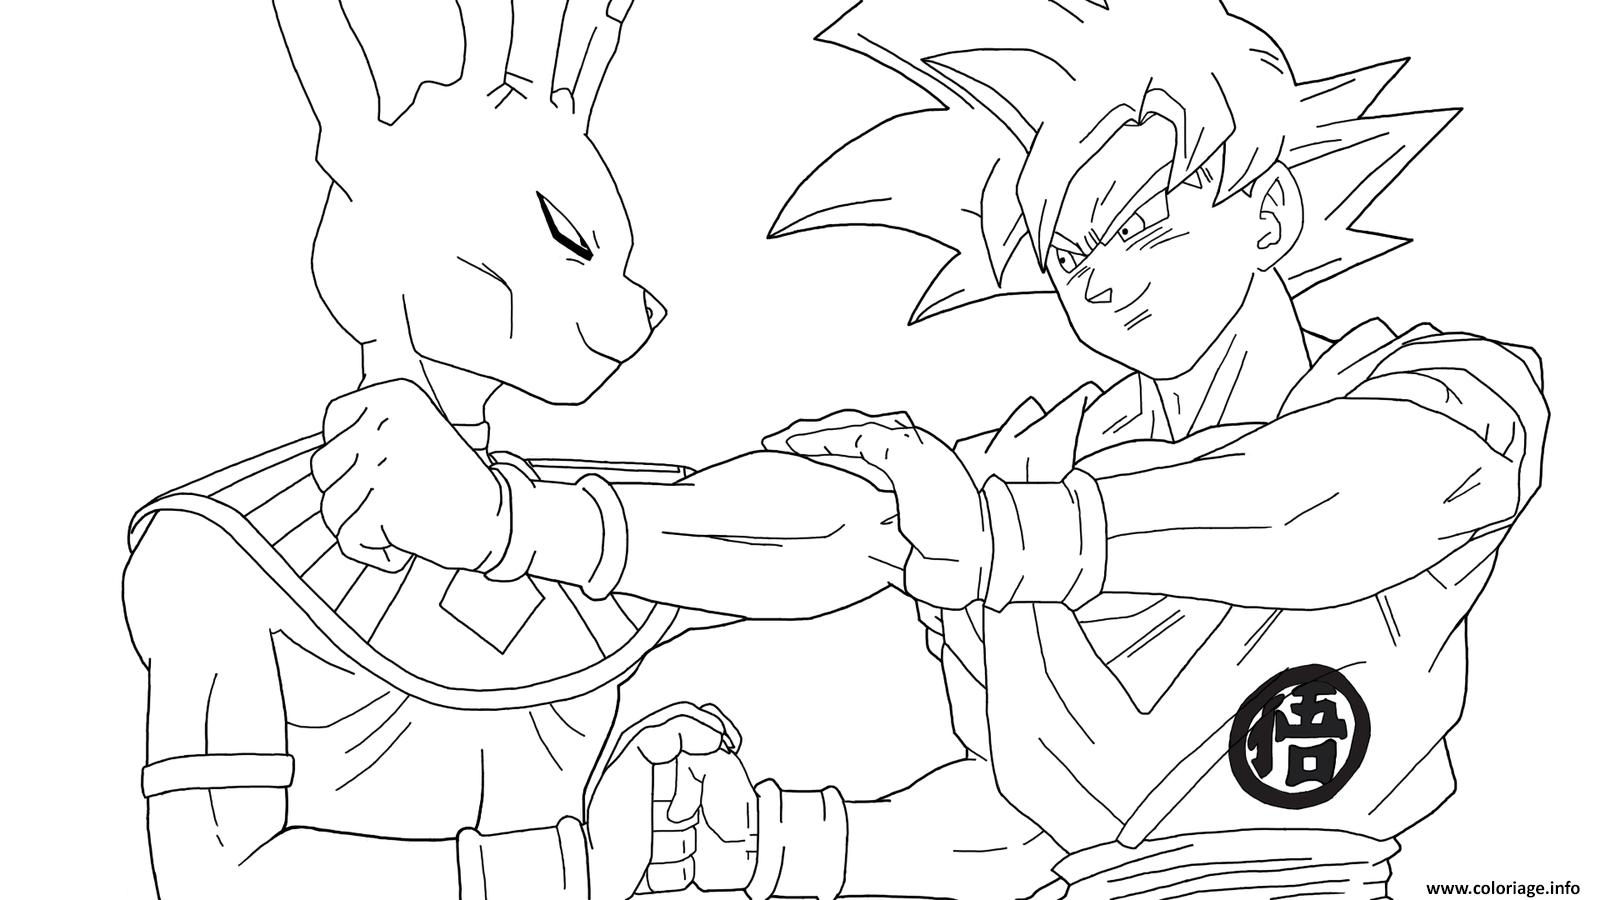 Coloriage Beerus Vs Goku Super Saiyan Gold Dbz Dessin ...